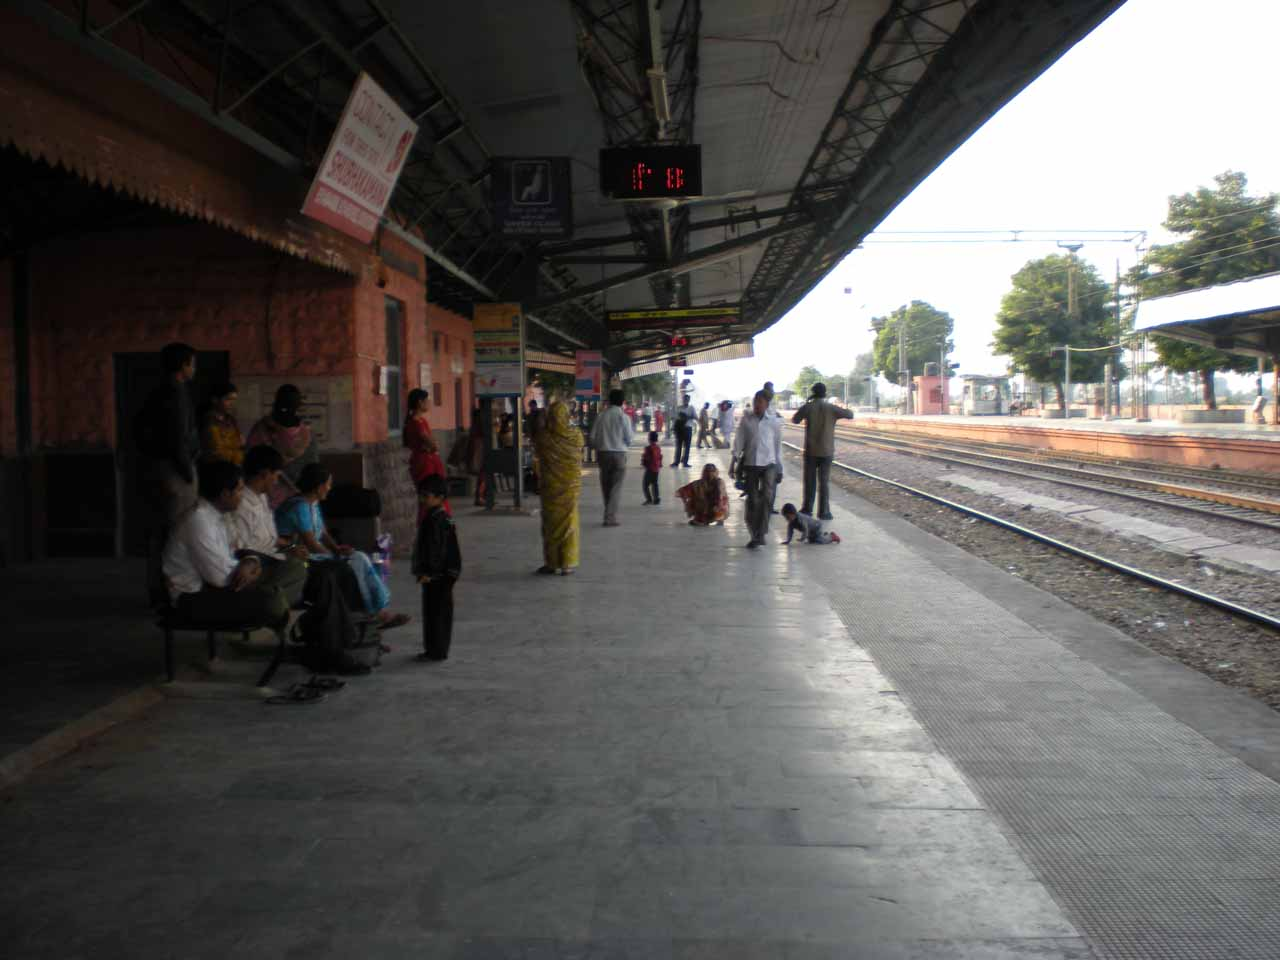 At the train station awaiting our train ride to Rantambhore